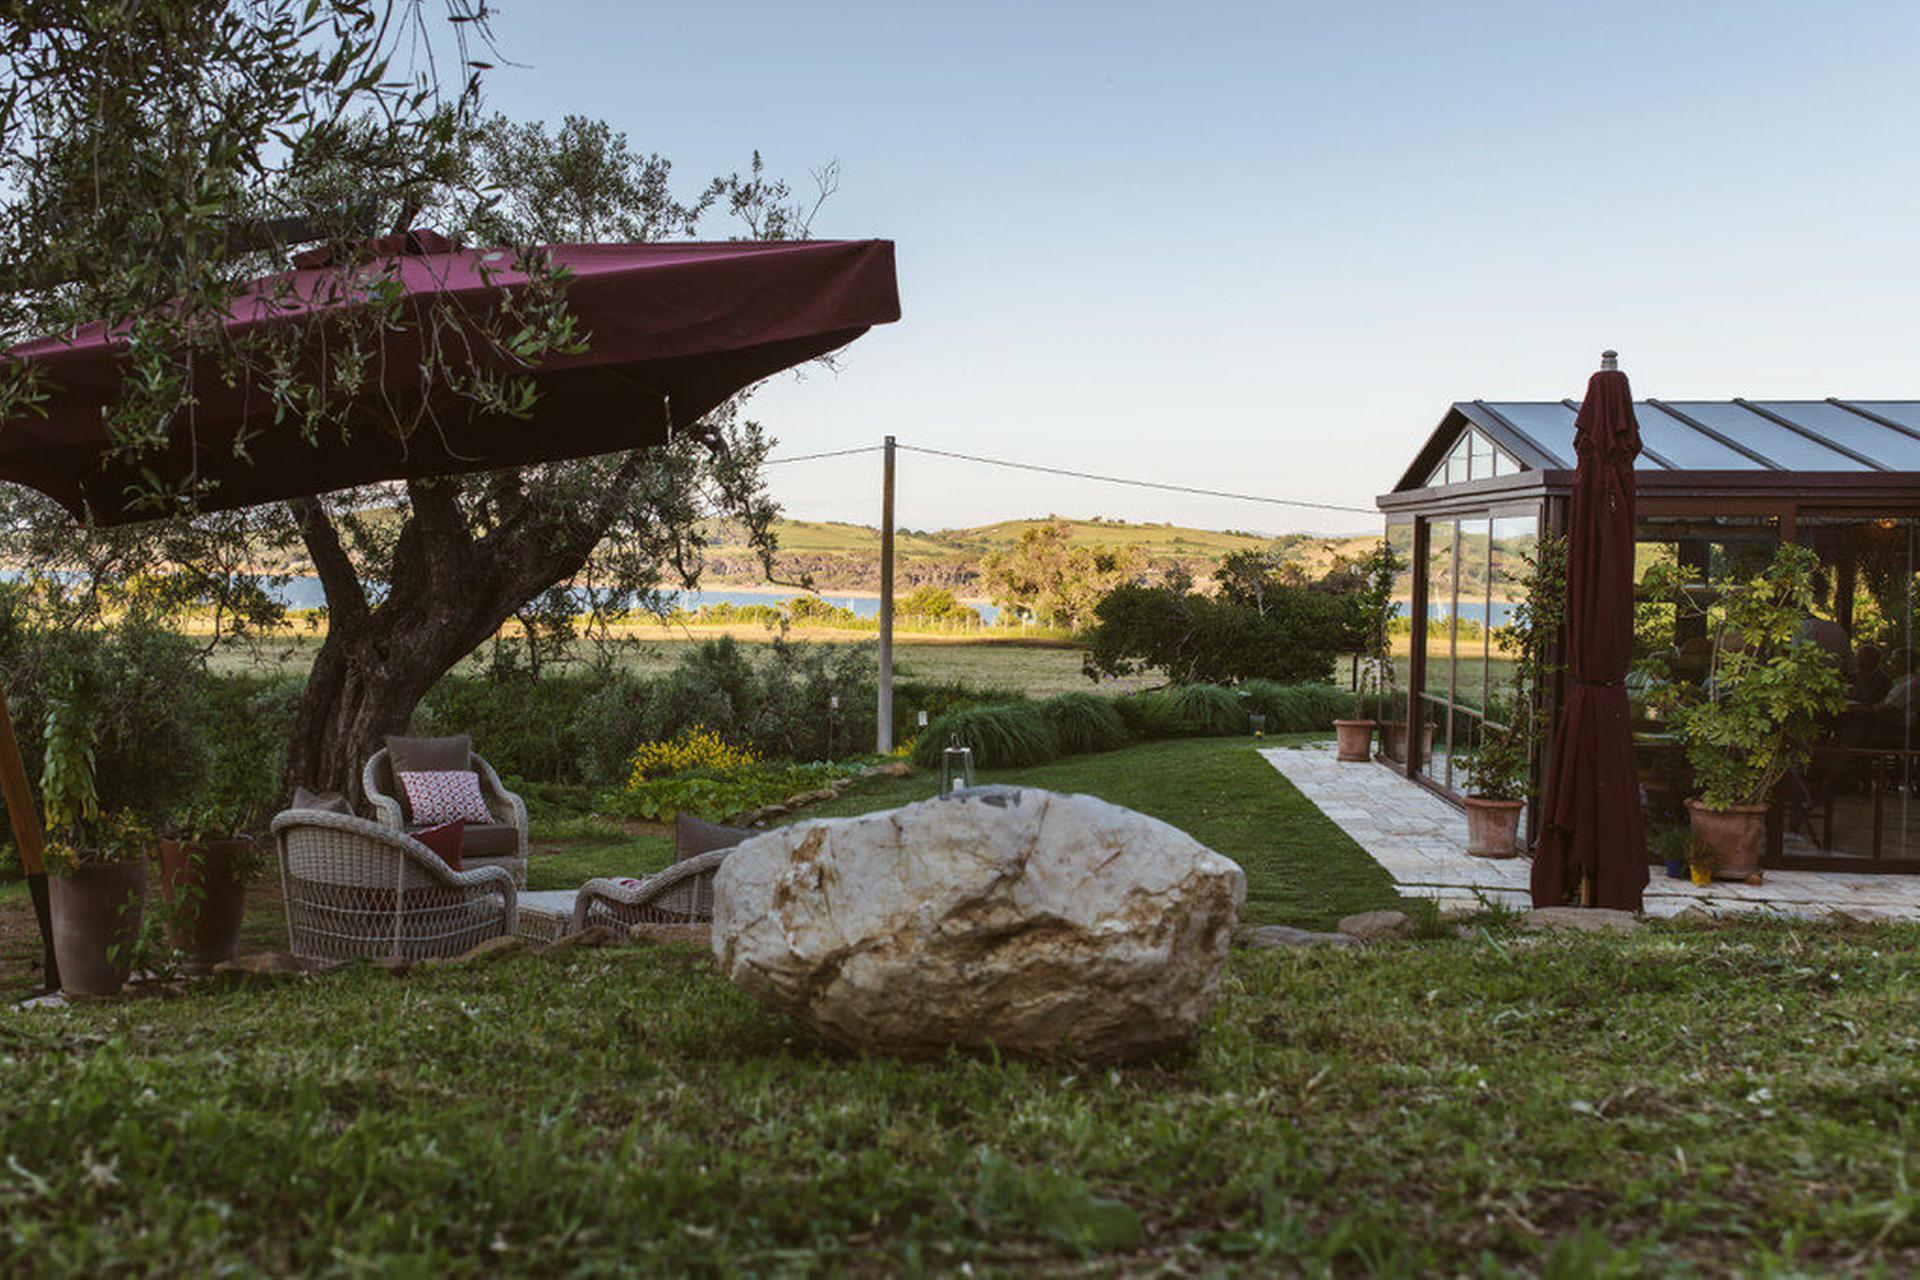 Agriturismo Apulien Agriturismo in Apulien, Landhaus mit herrlichem Pool